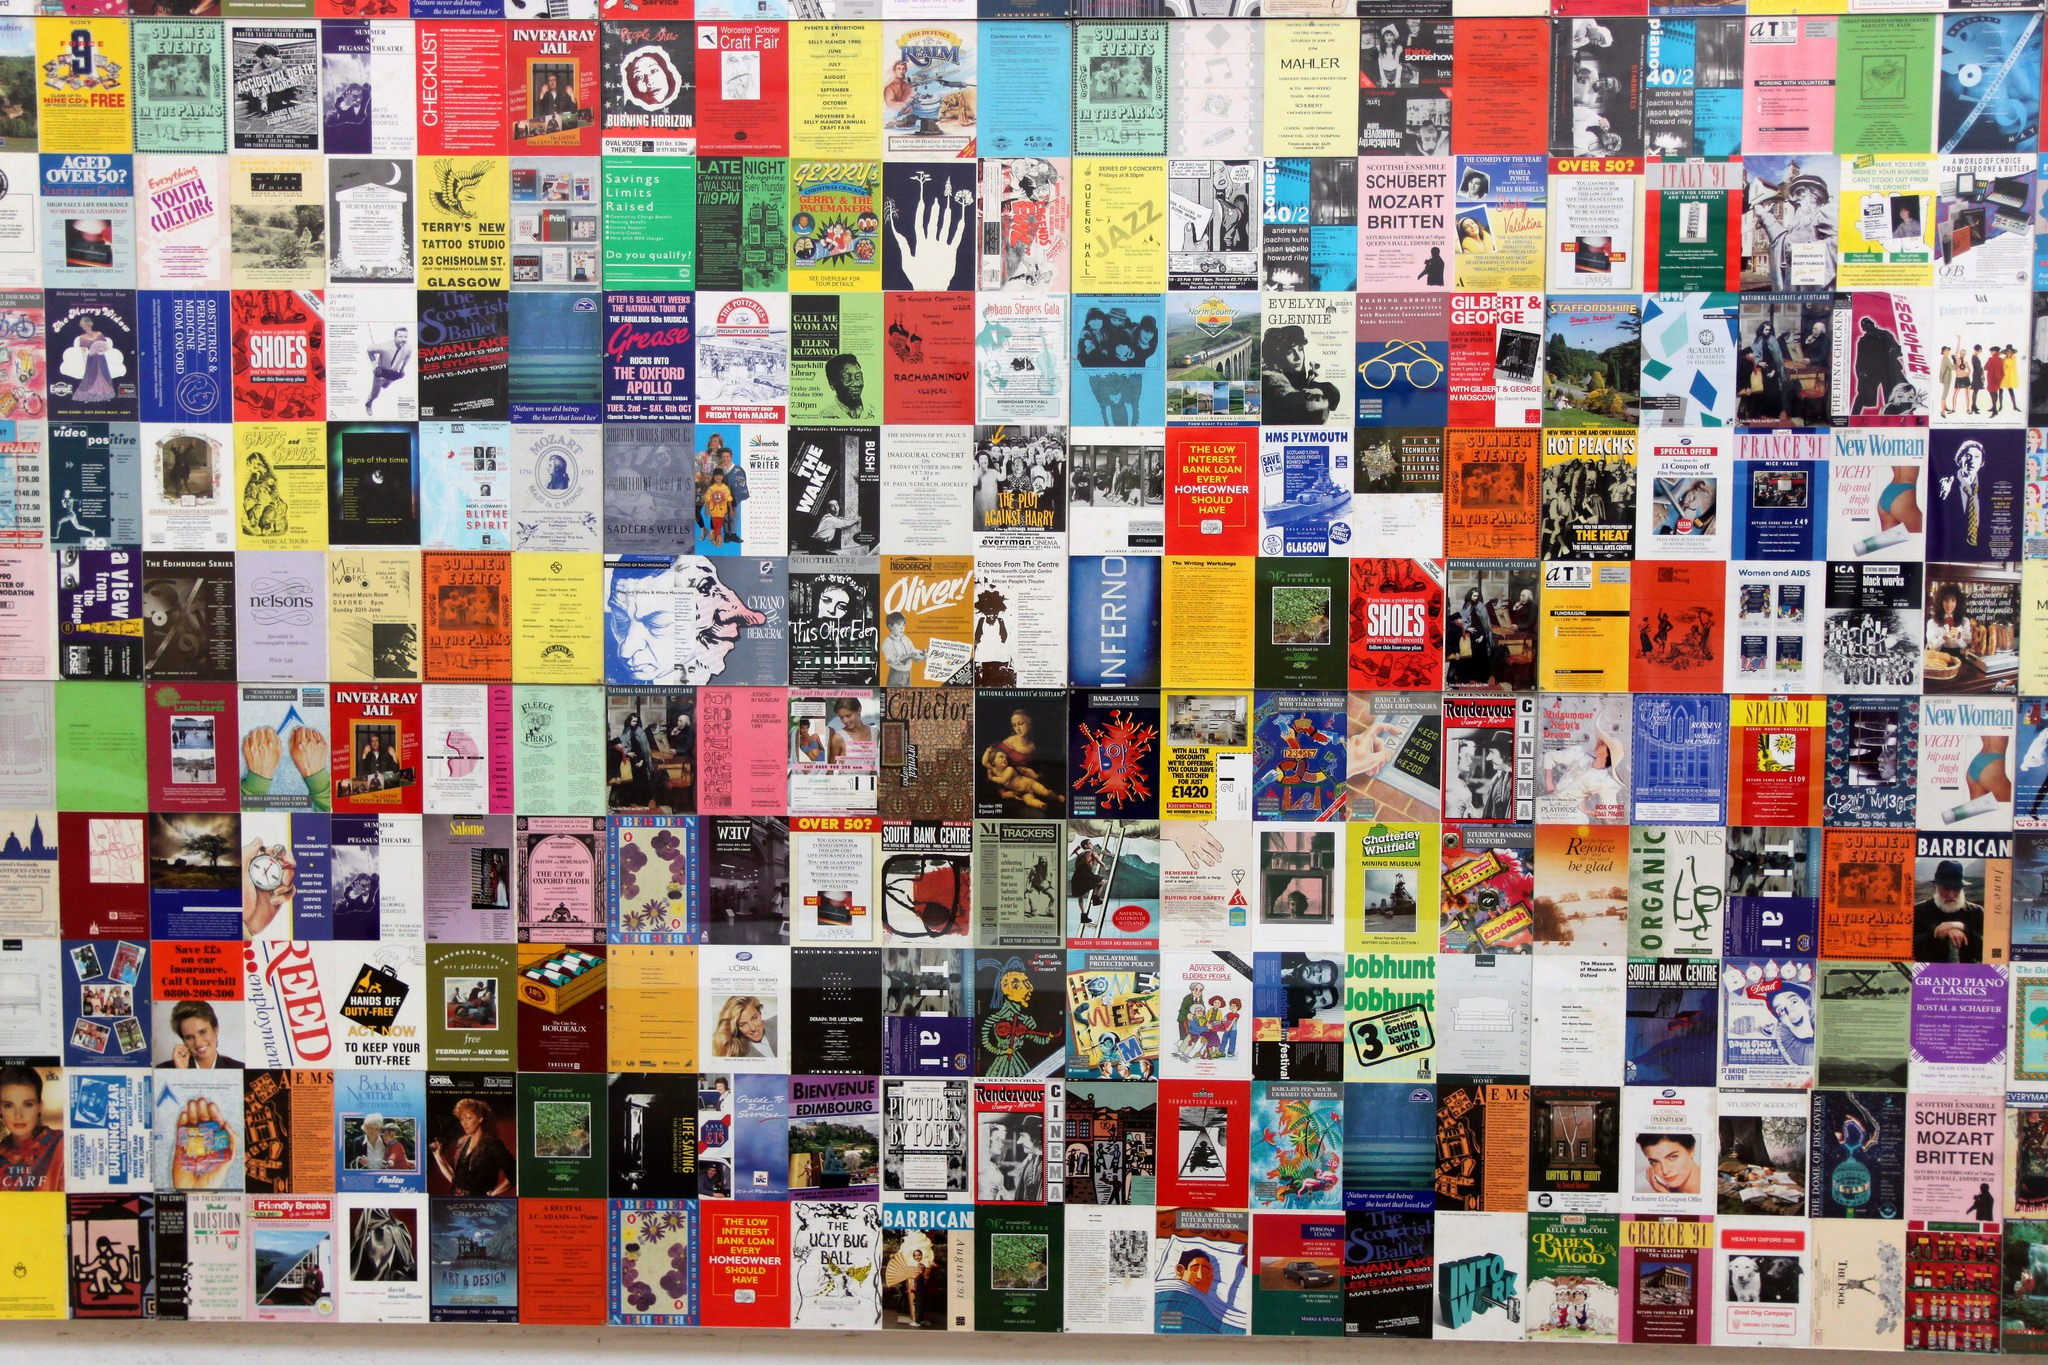 Modern Art Oxford, Book covers | © Muffinn/Flickr